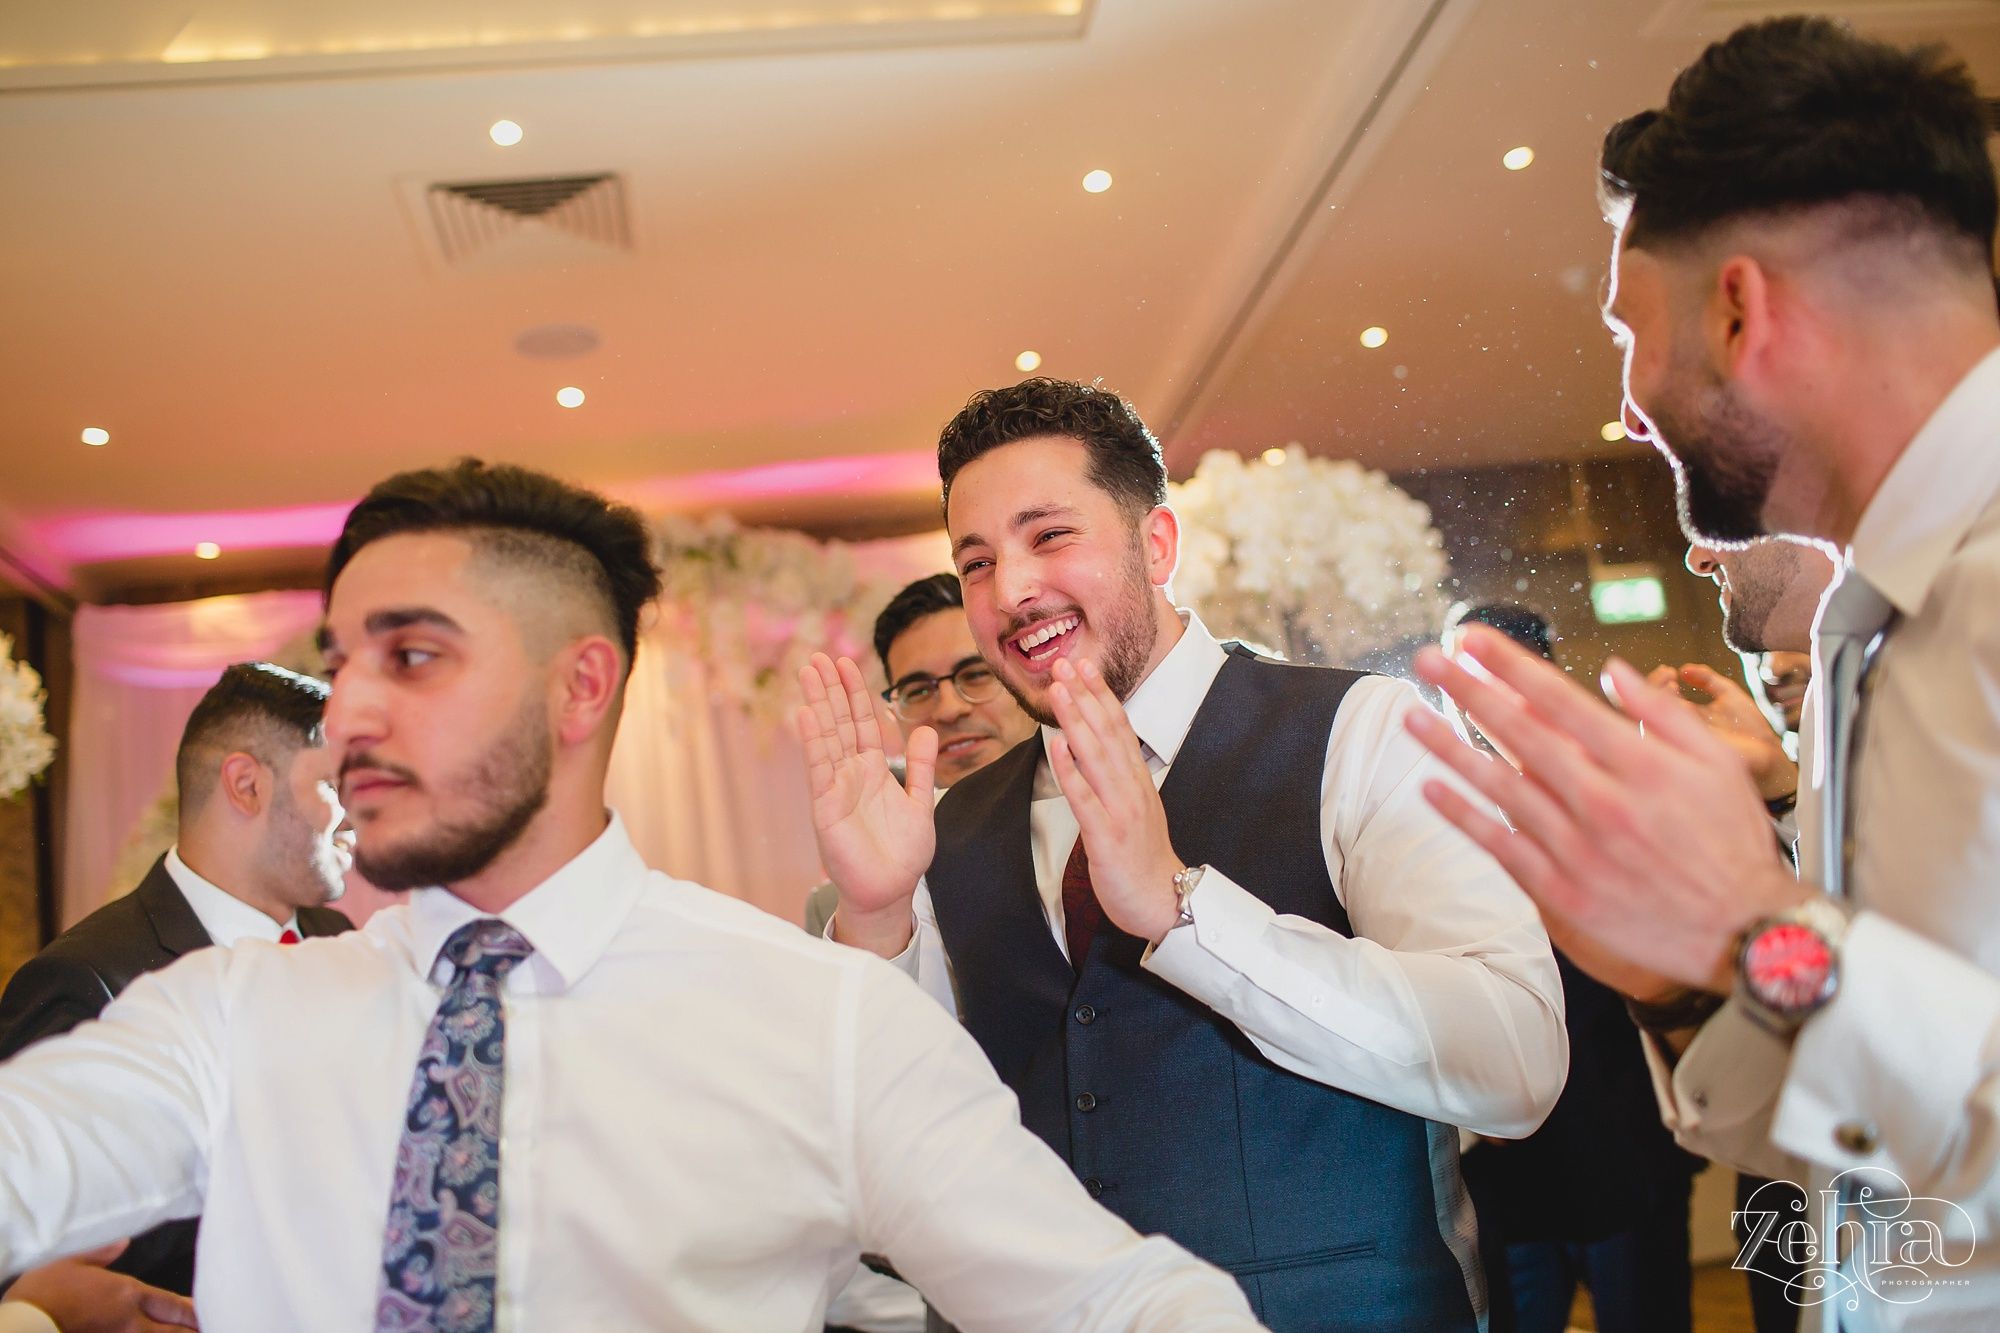 zehra photographer mere cheshire wedding_0052.jpg